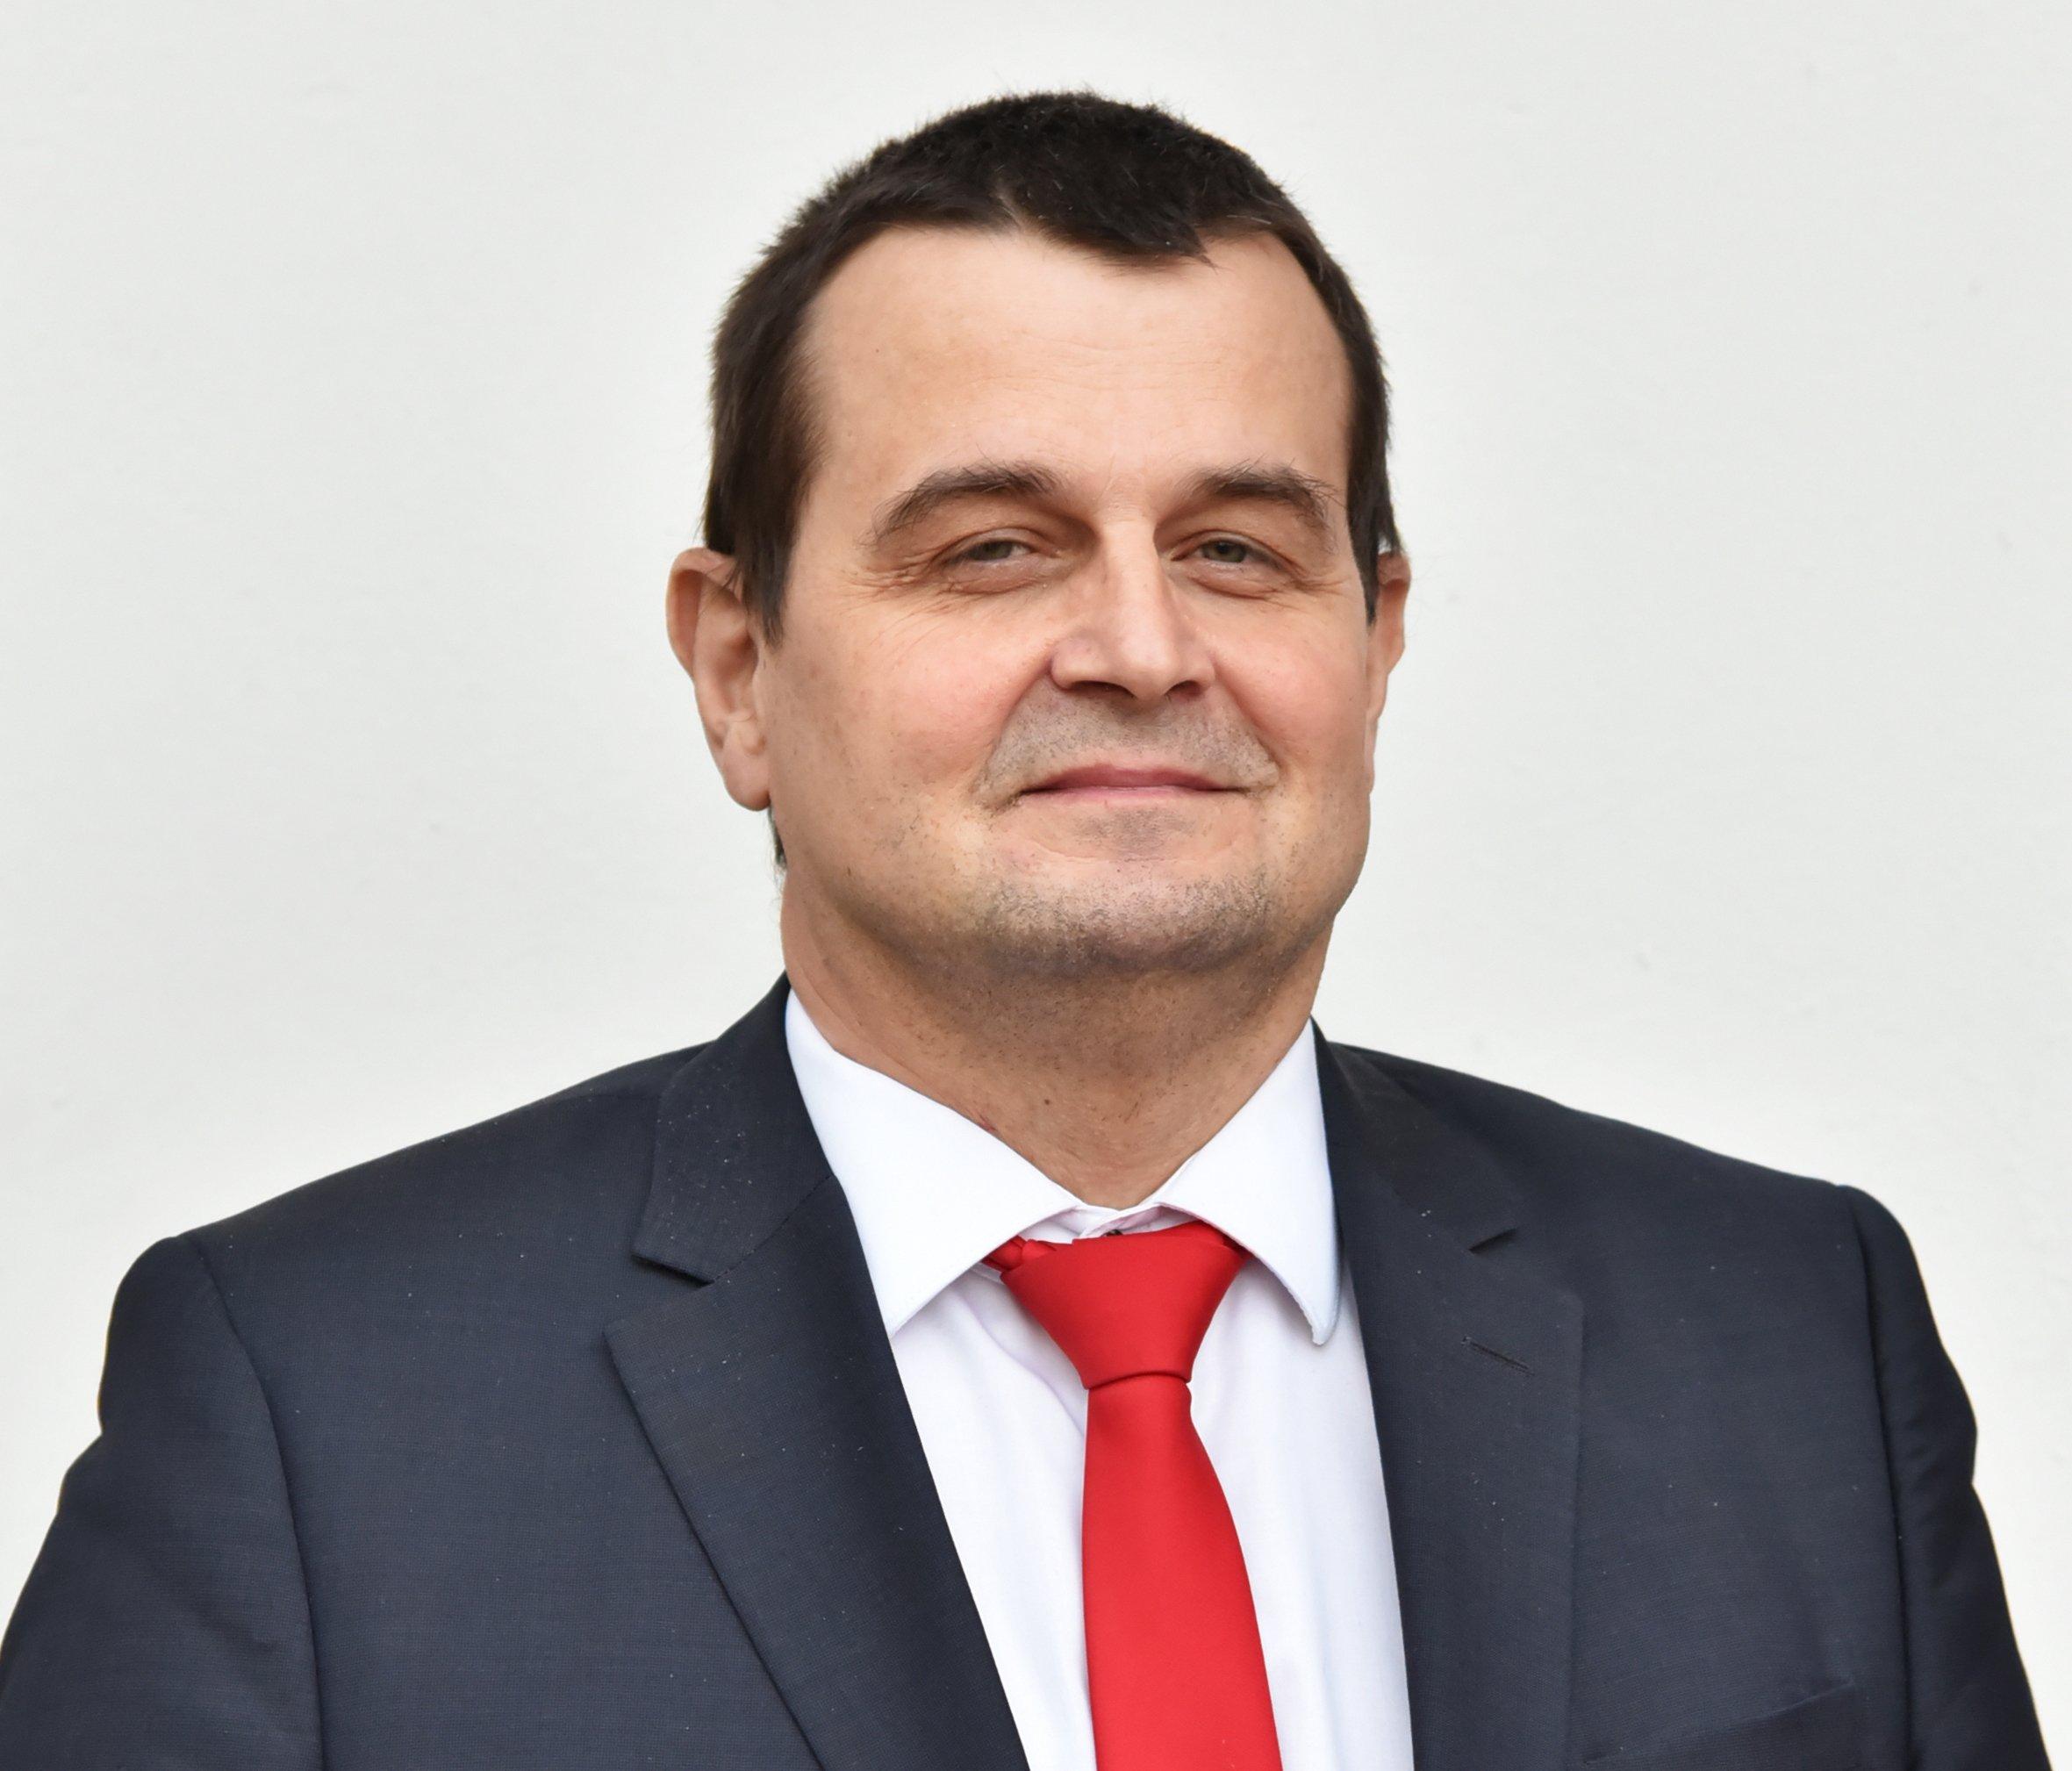 Mr. Pavel Volek